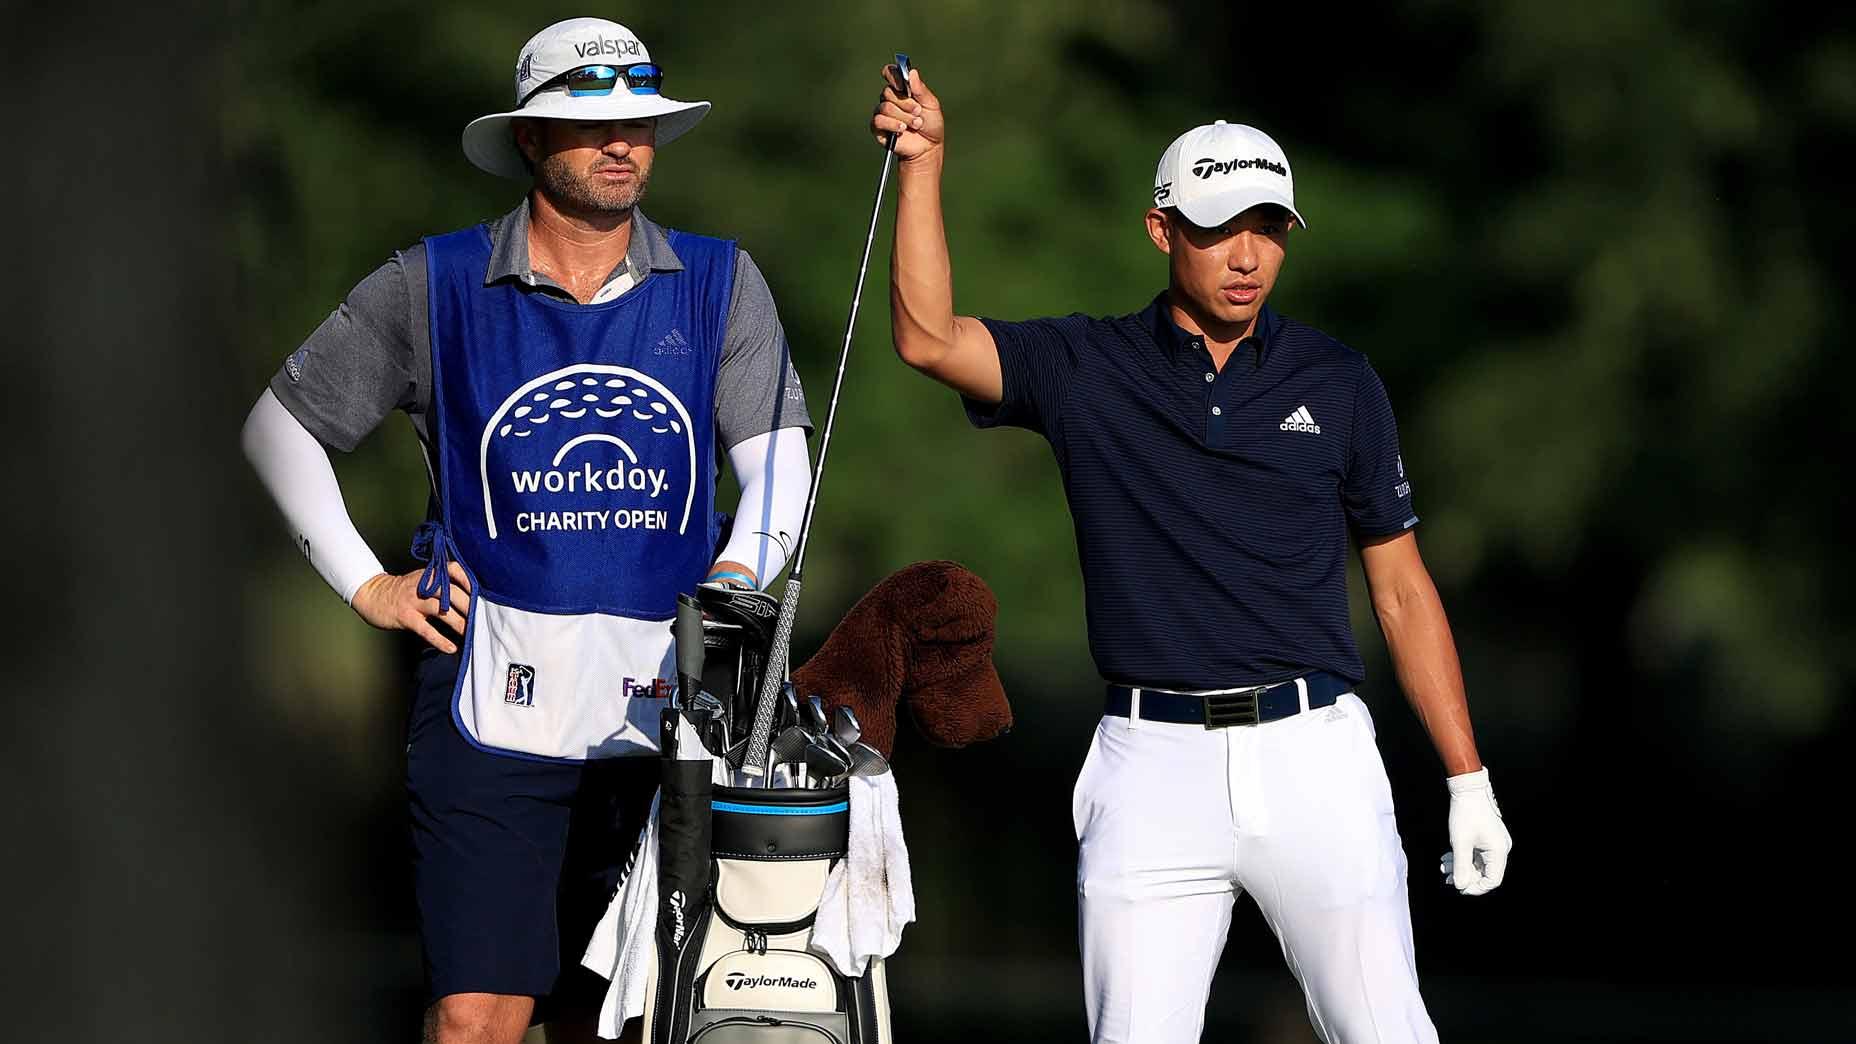 Pro golfer Collin Morikawa with caddie